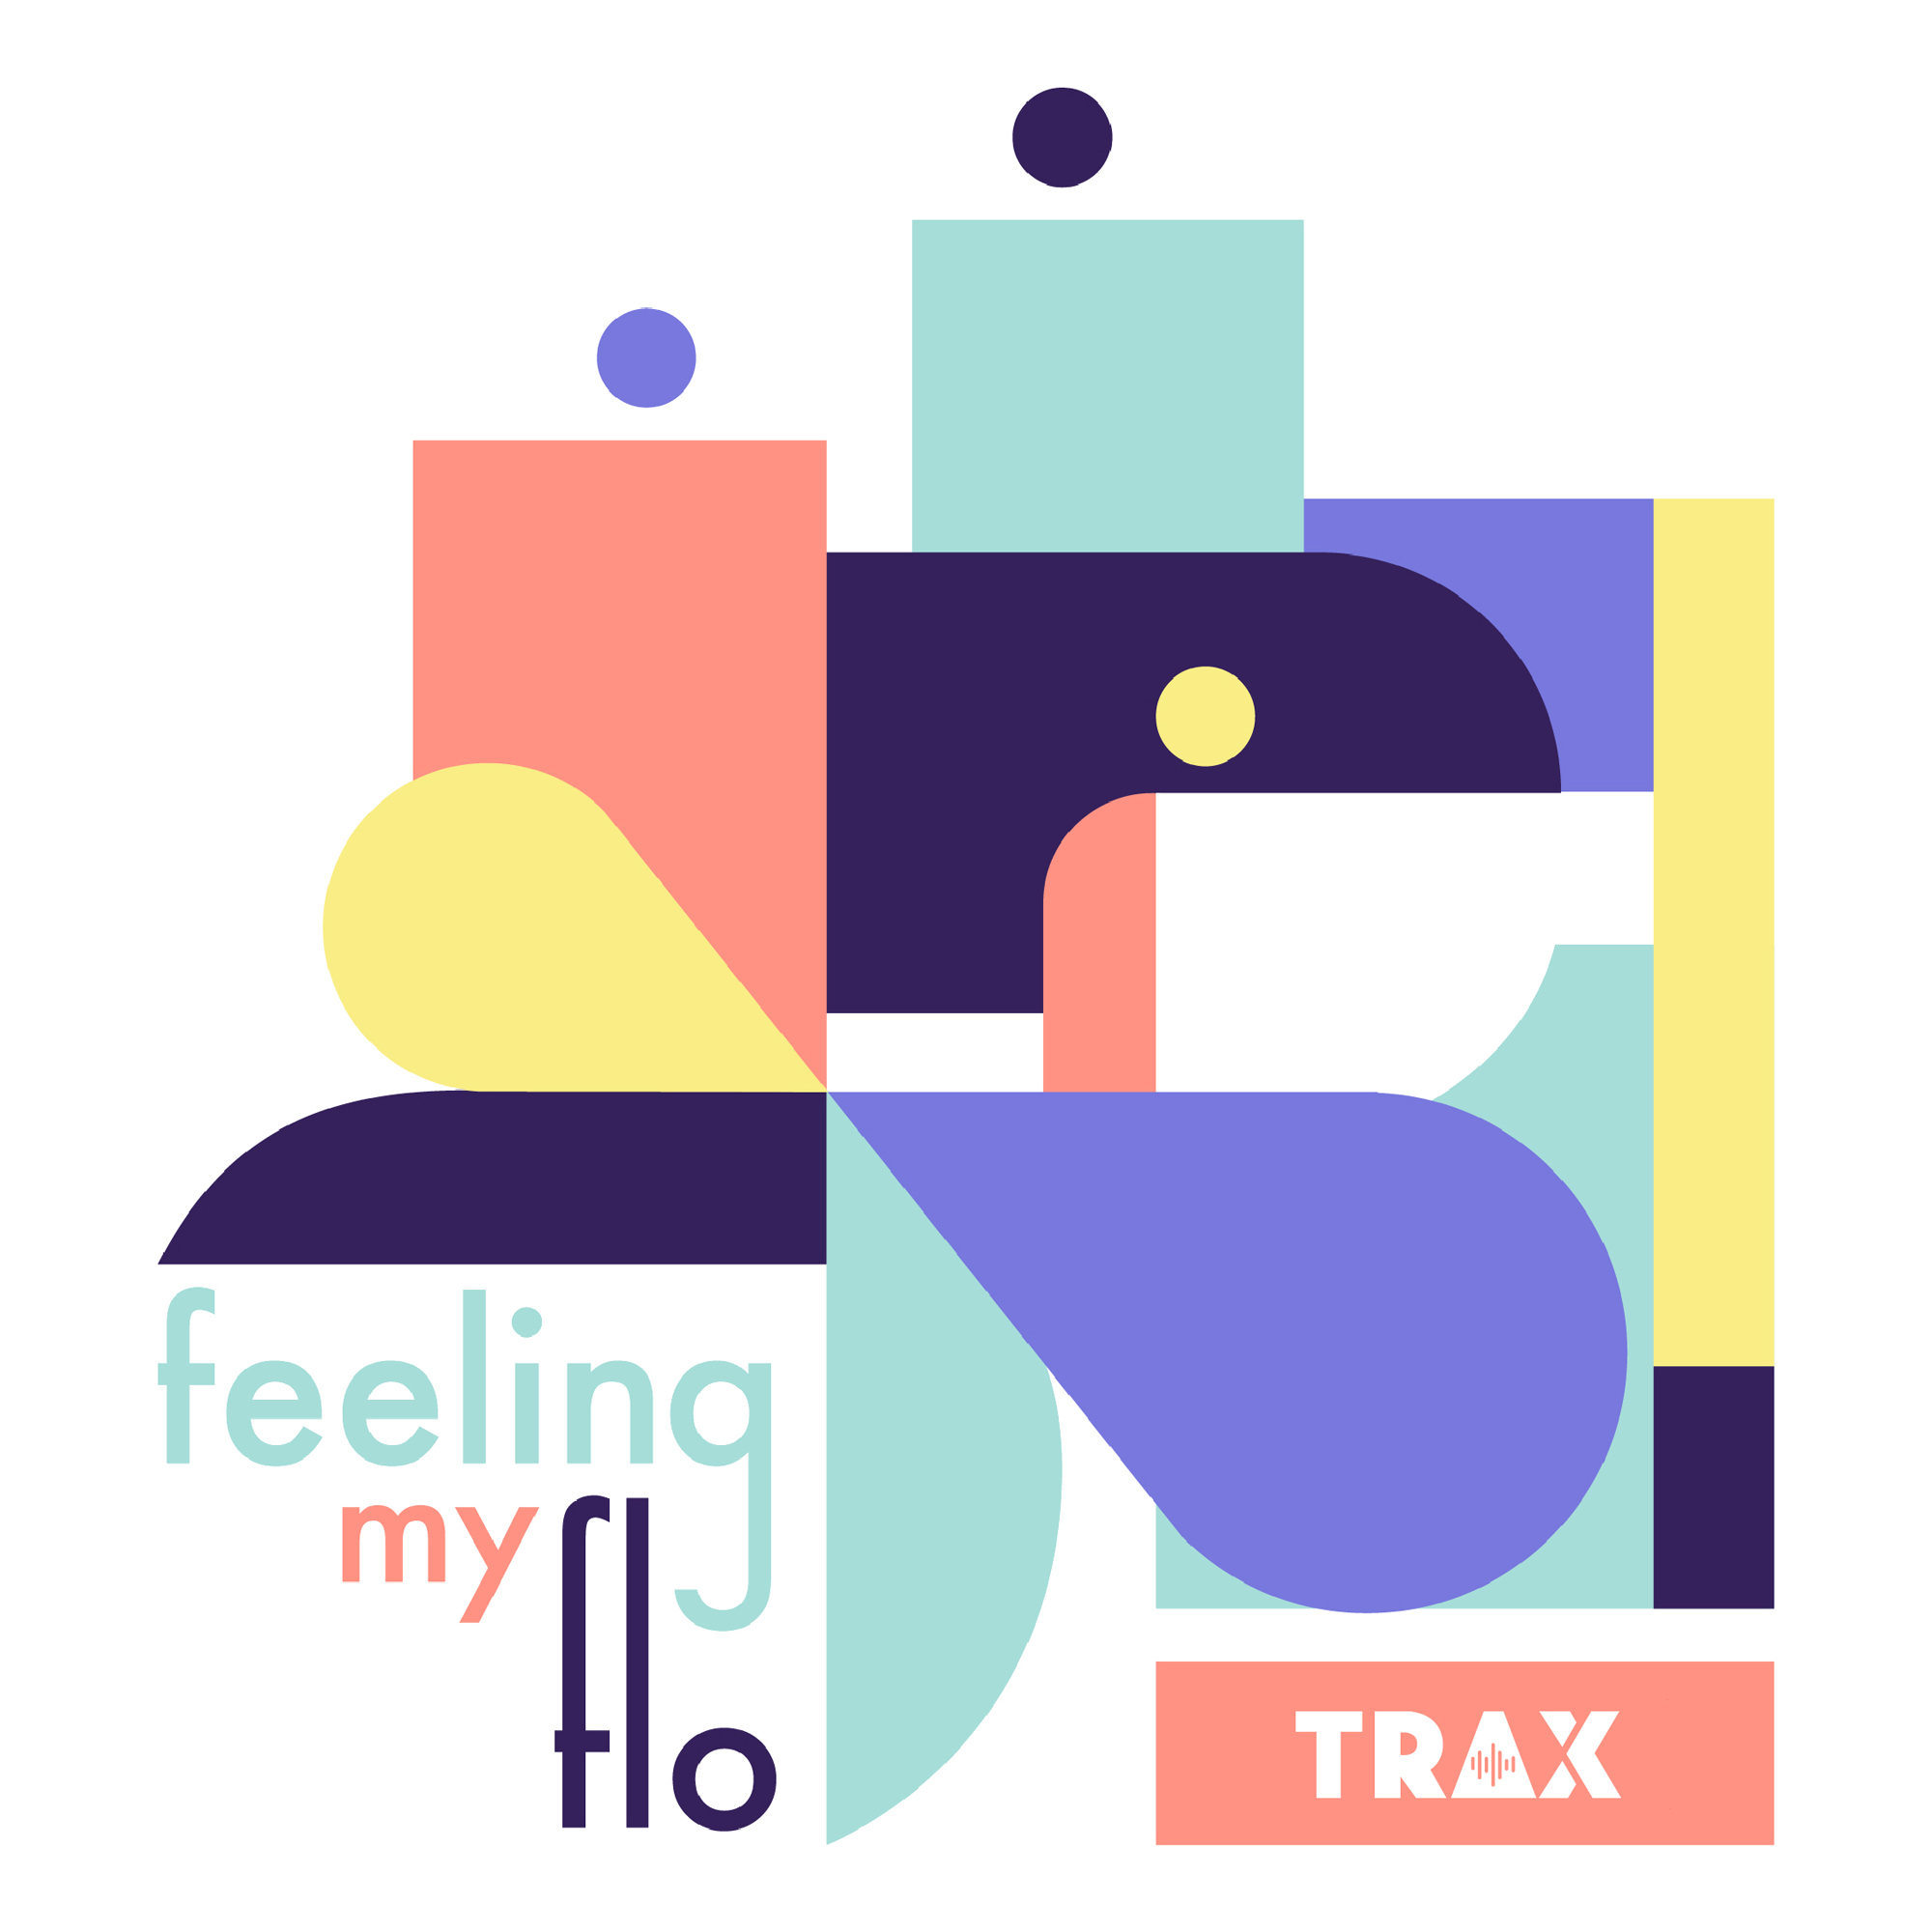 Feeling My Flo logo